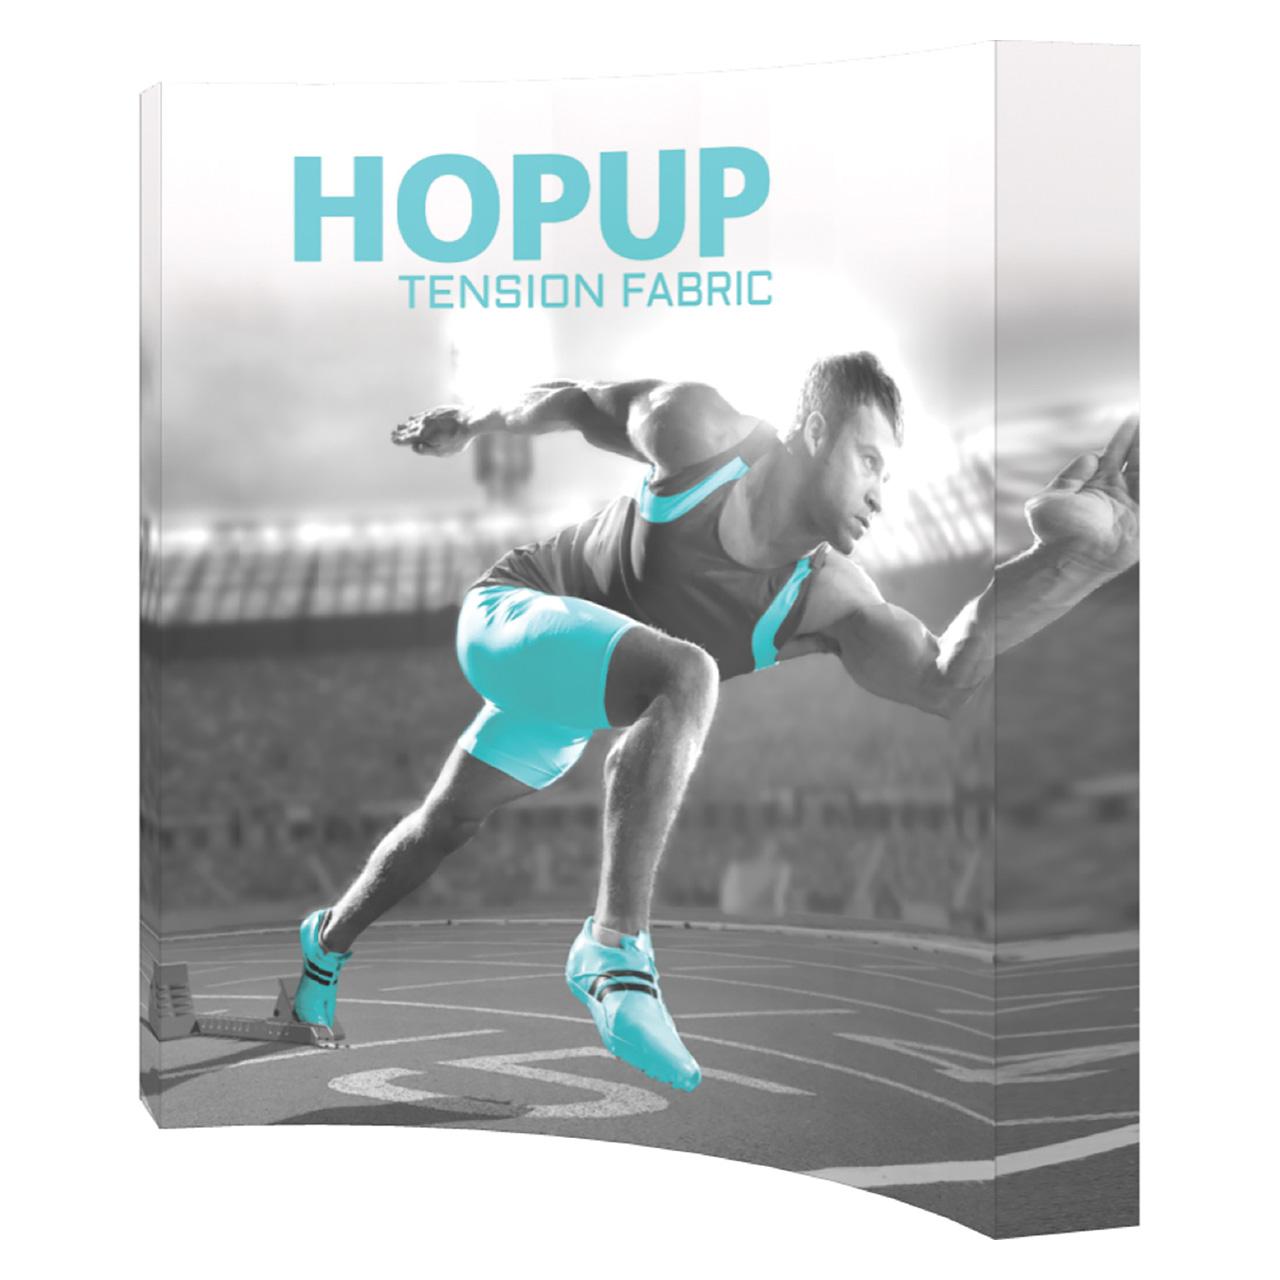 hop-3x3fge-c-1-right.jpg